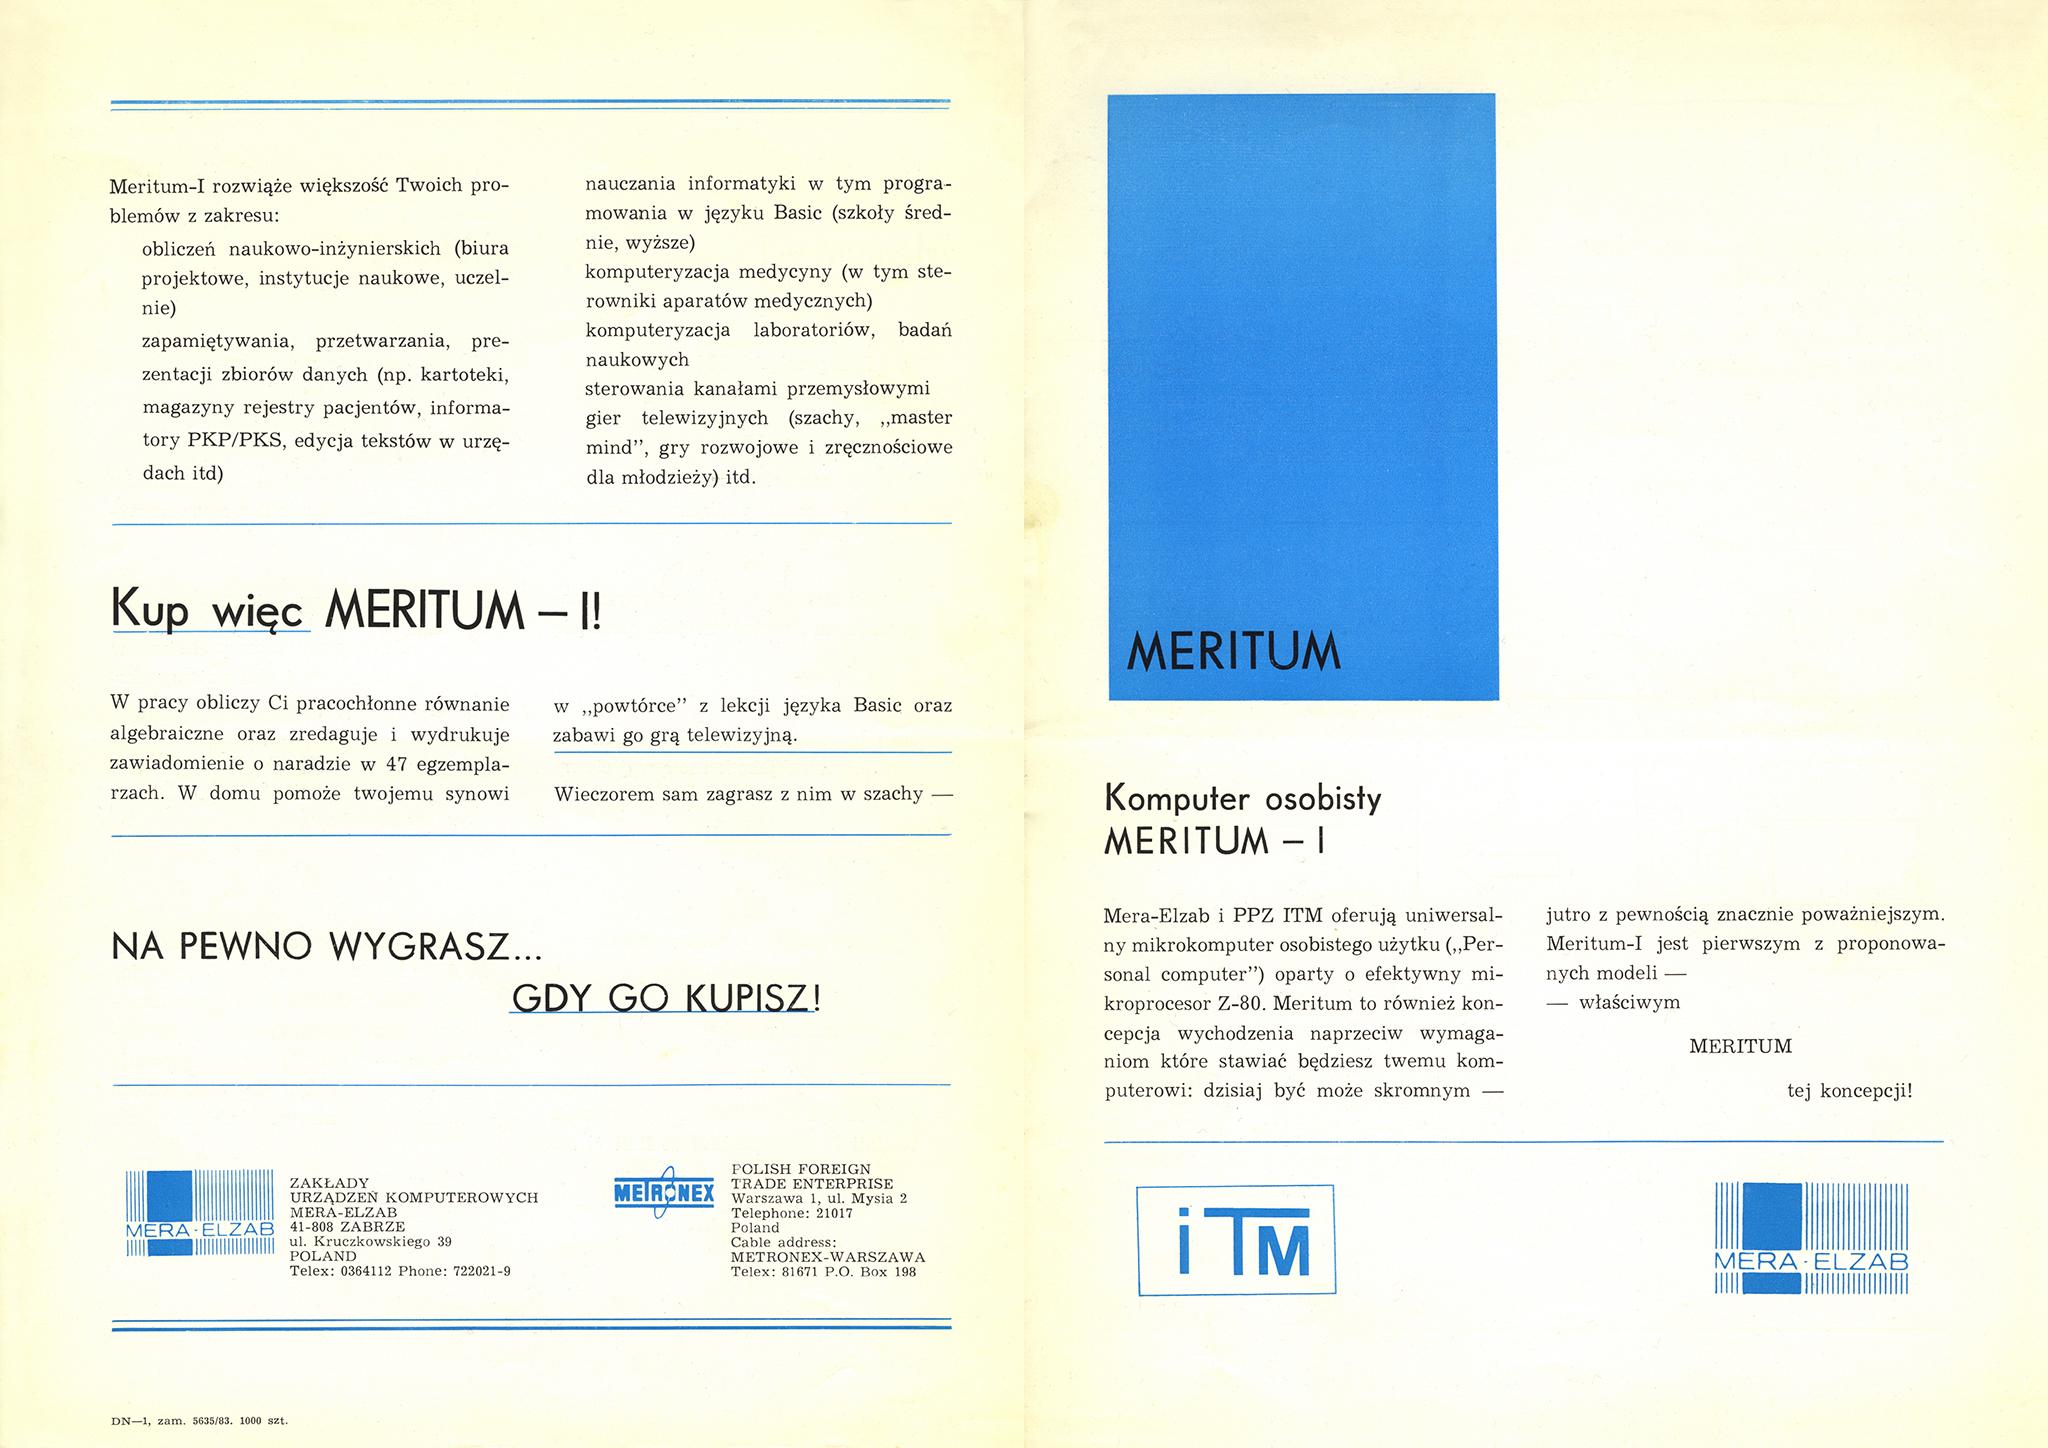 Komputer osobisty Meritum I